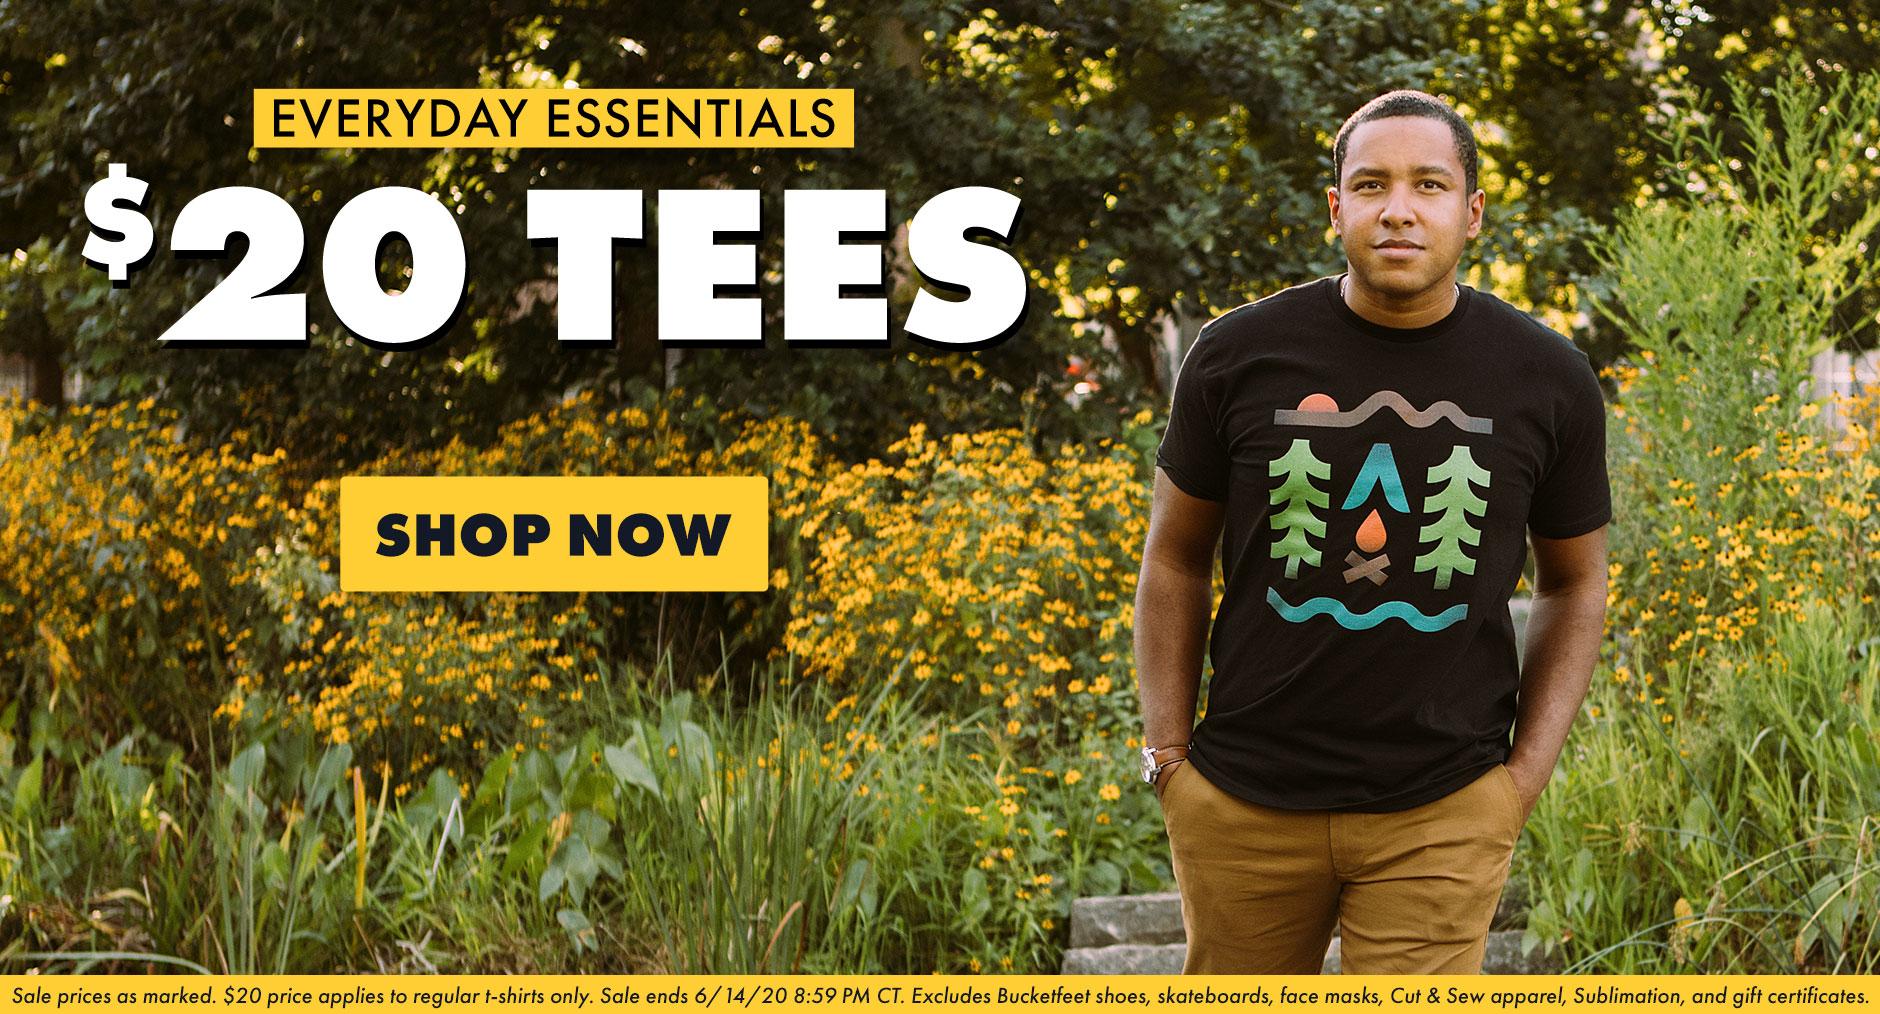 Shop $20 Tees on Threadless